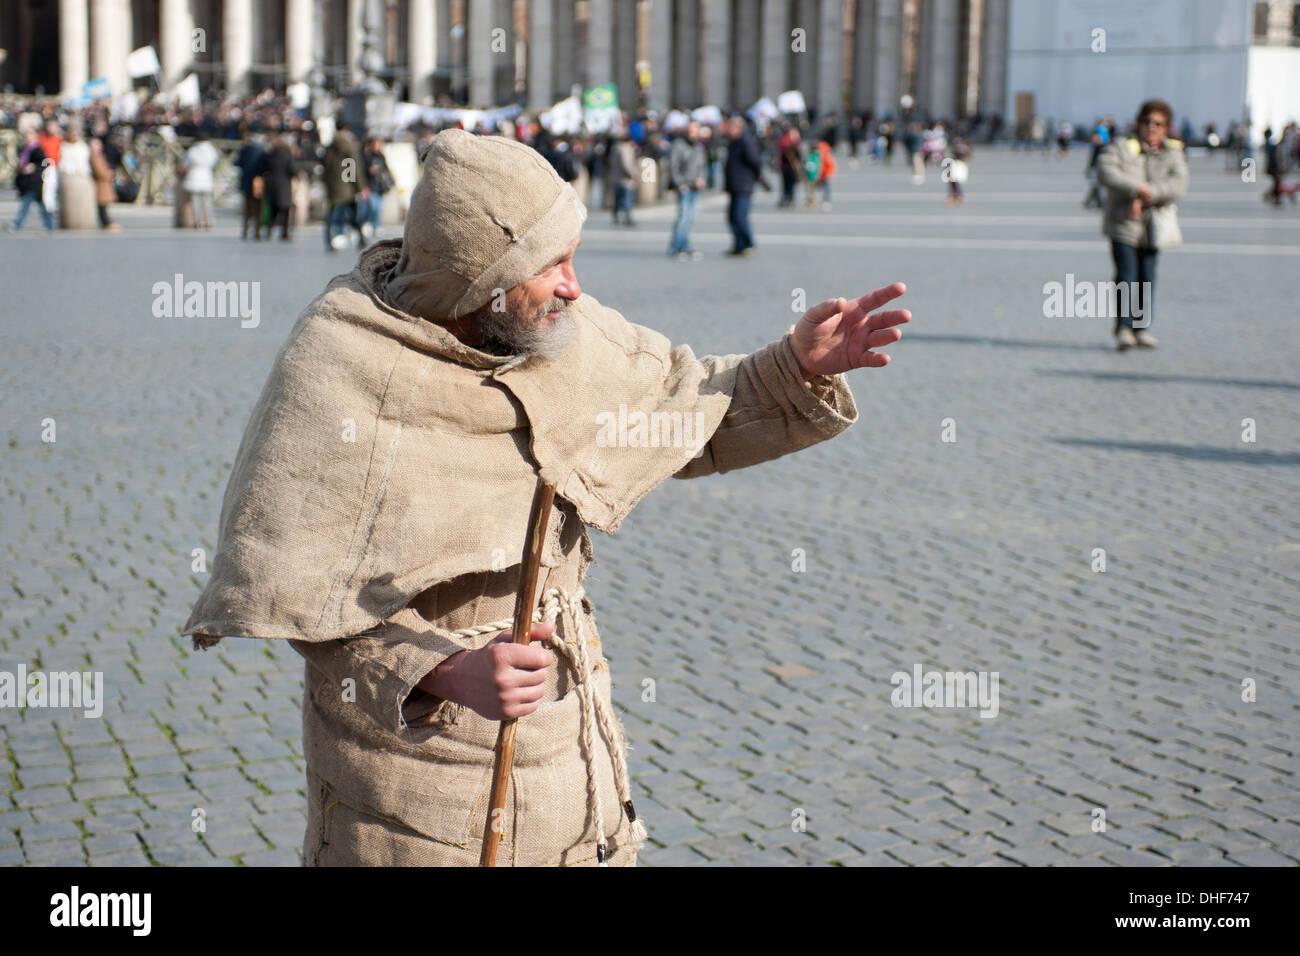 Man in habit in St.Peter's square - Stock Image